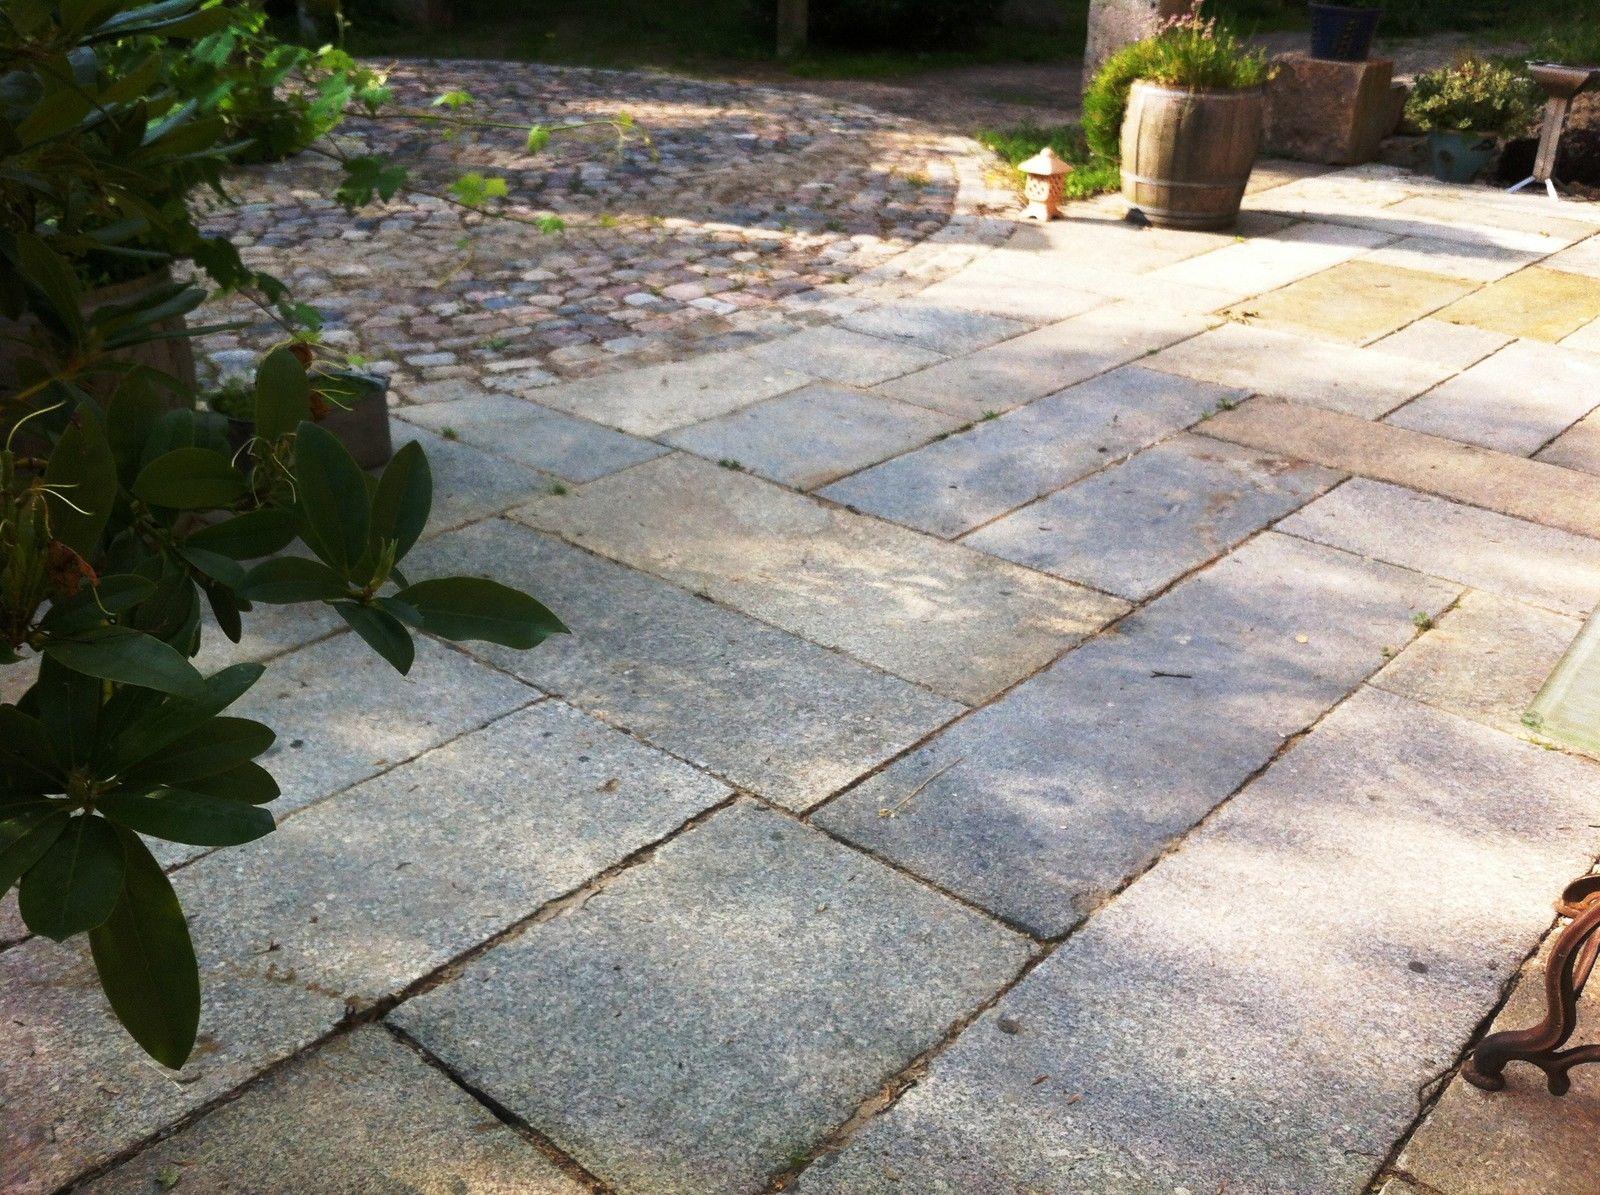 Historische Granitplatten, gebrauchte Krustenplatten, schöne alte Gredplatten